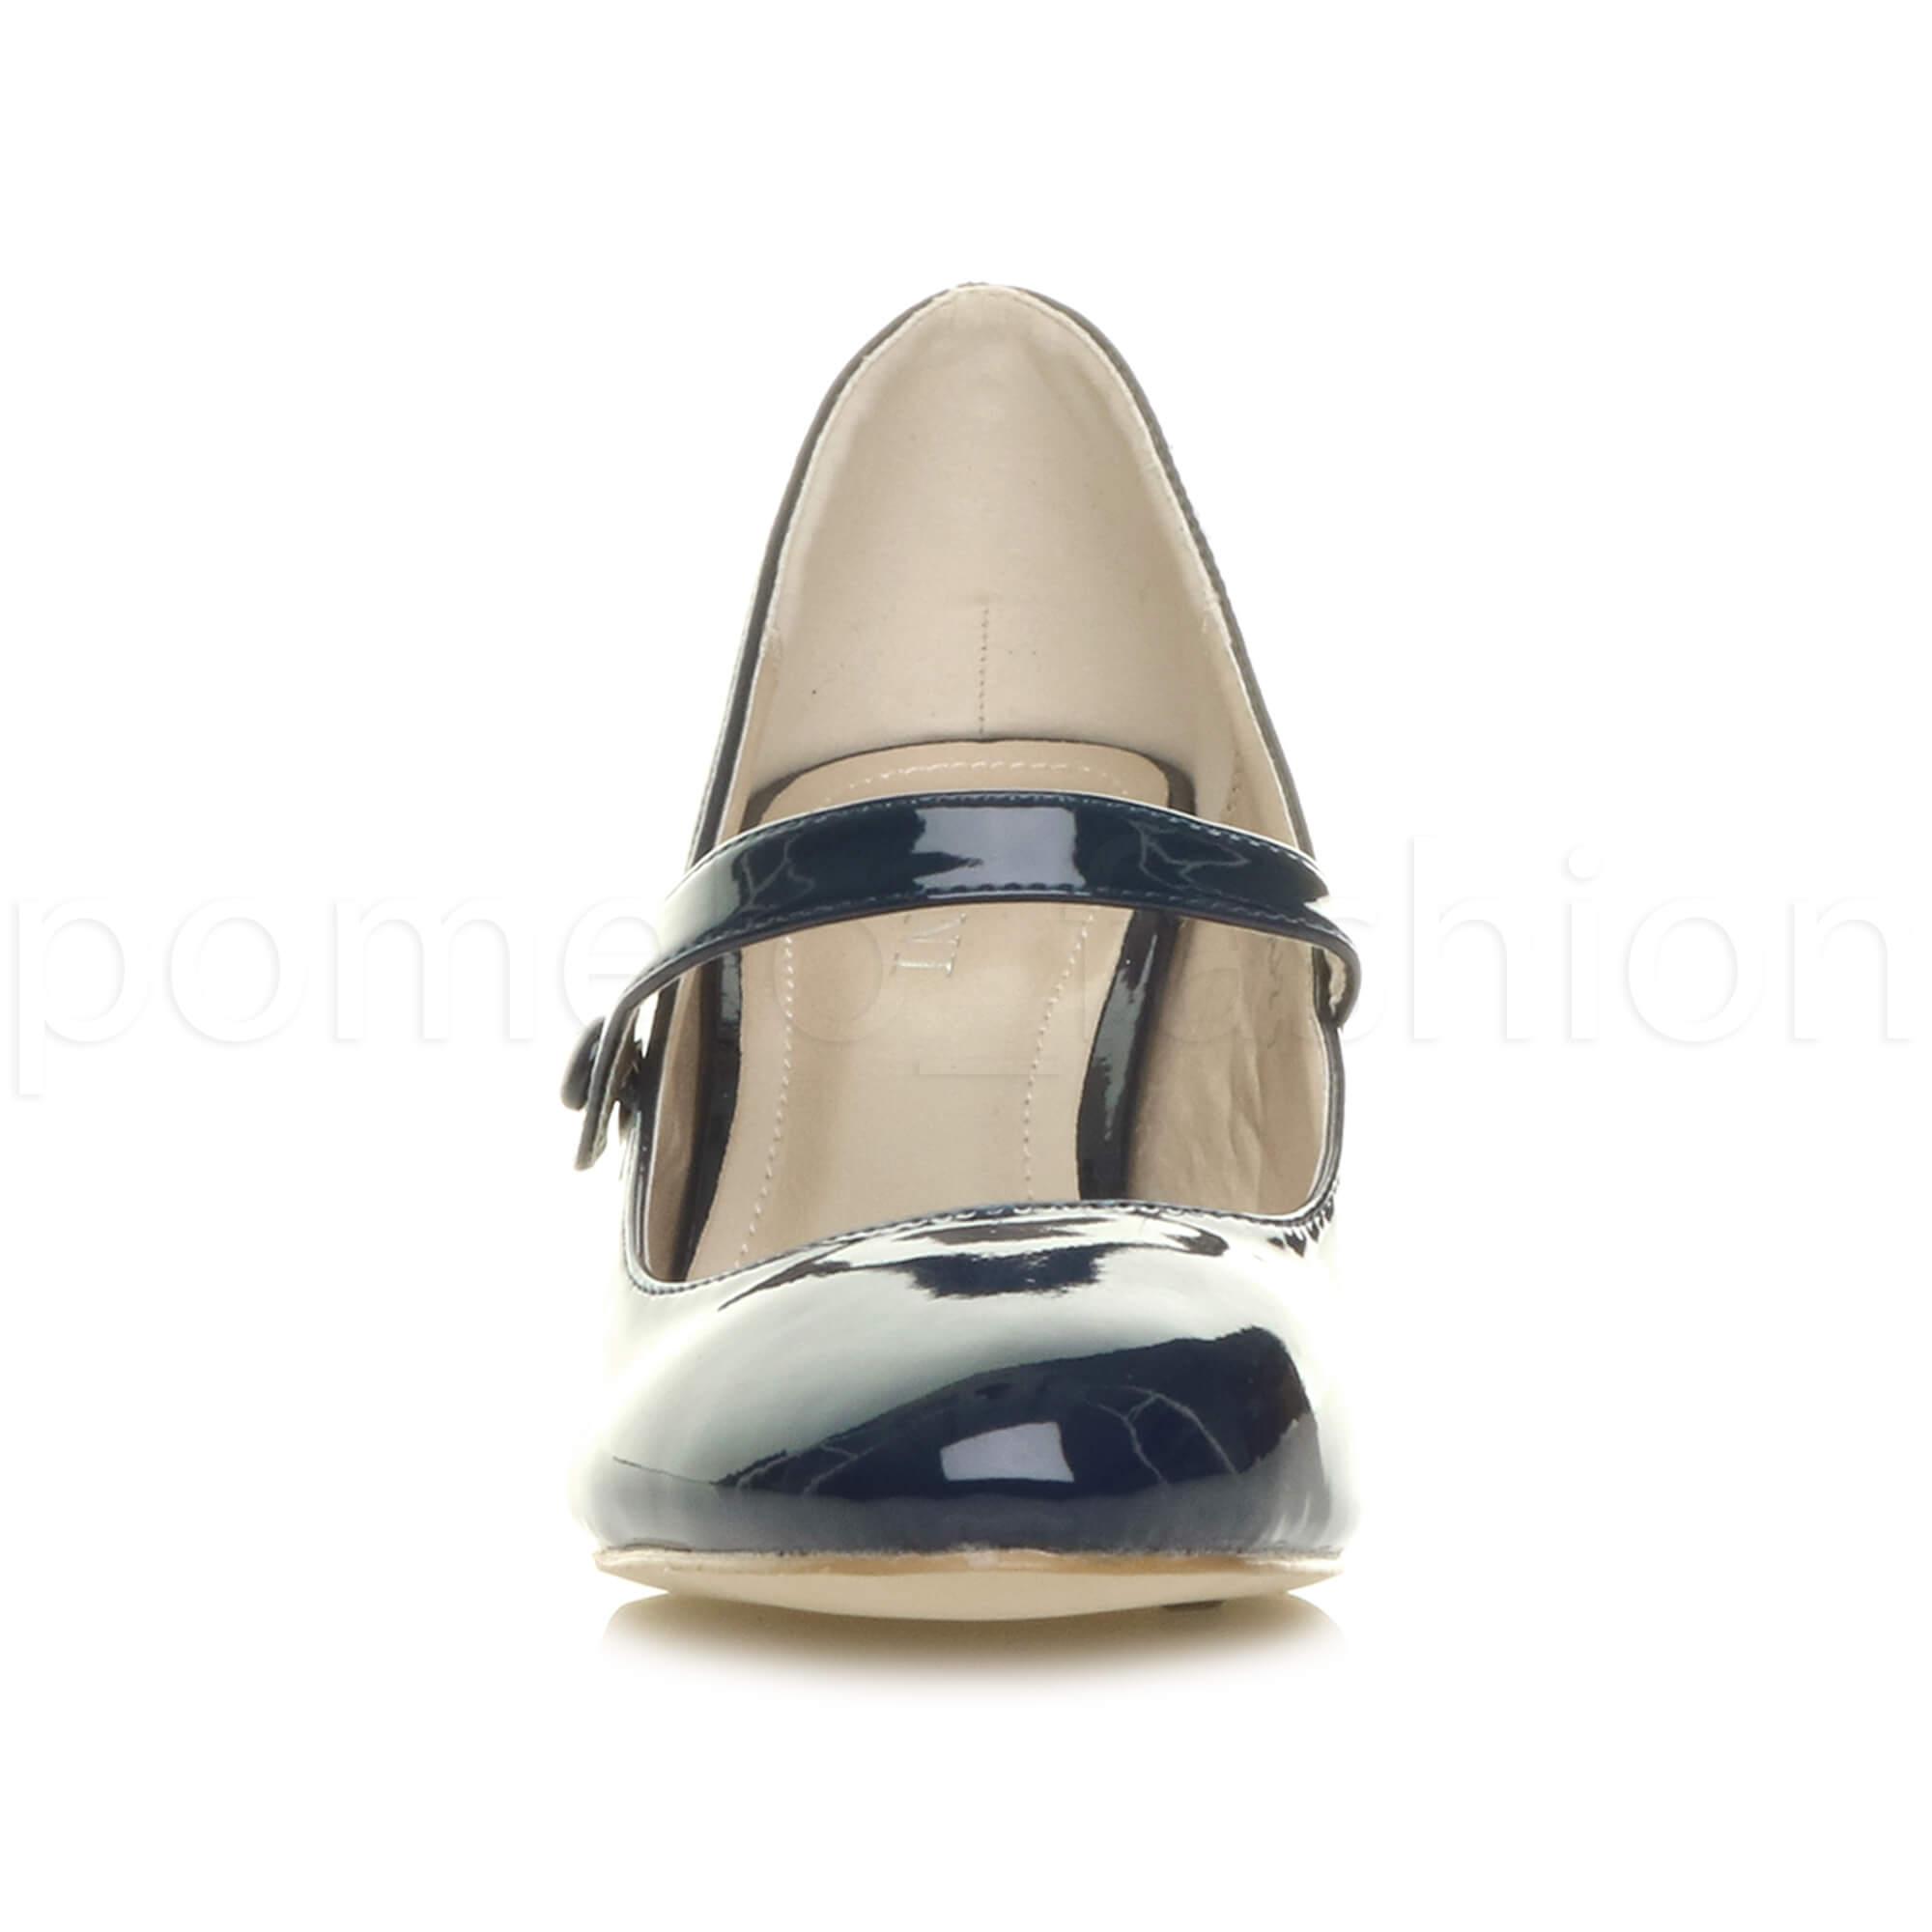 miniatura 104 - Donna basso tacco medio Mary Jane Damigella Matrimonio Pompe Scarpe Da Sera Taglia